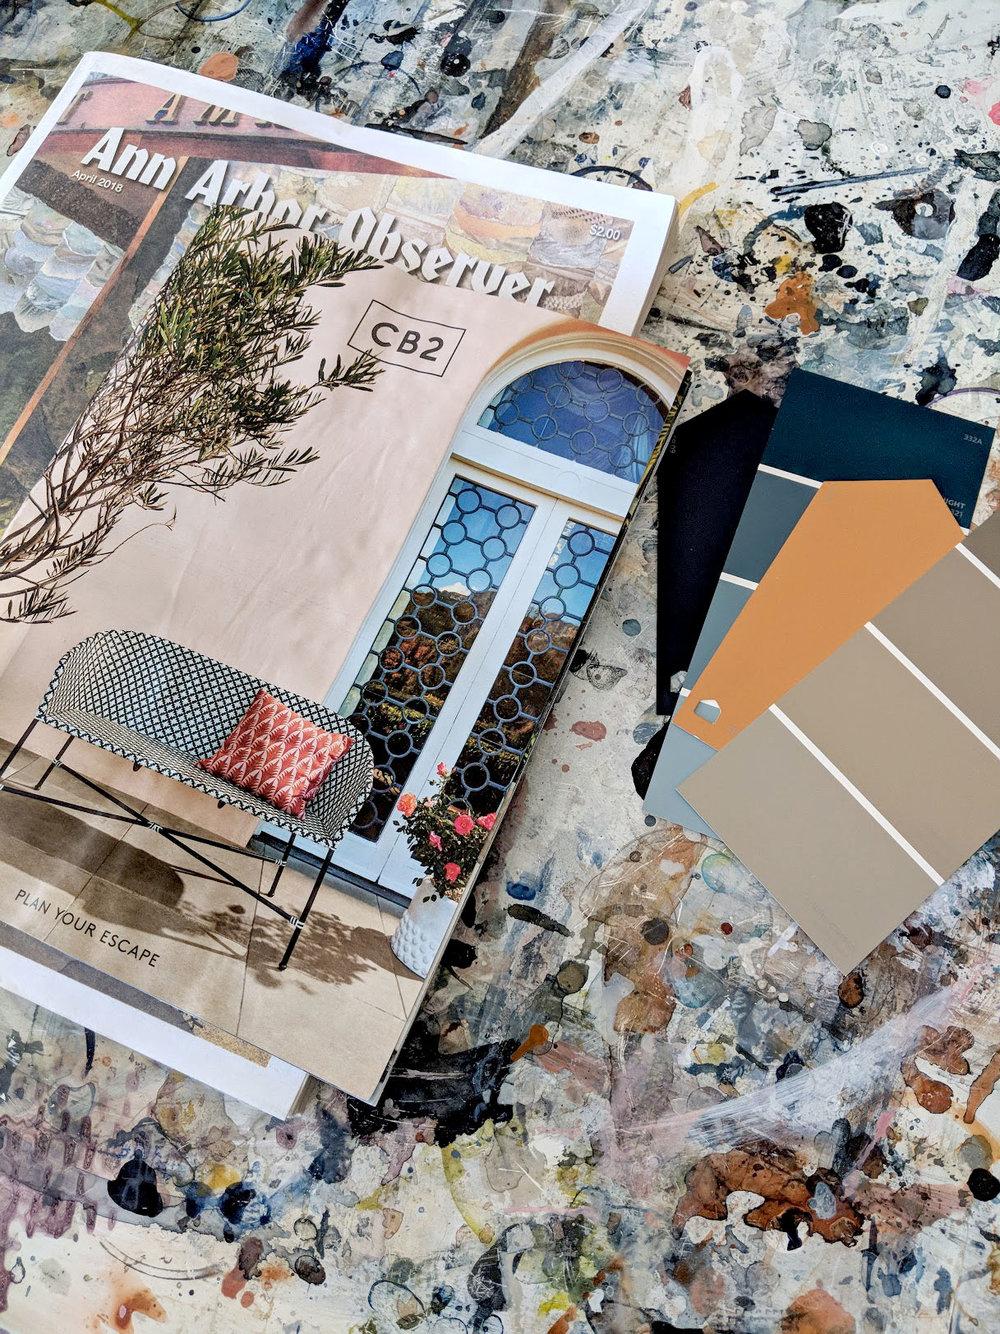 Collage materials!